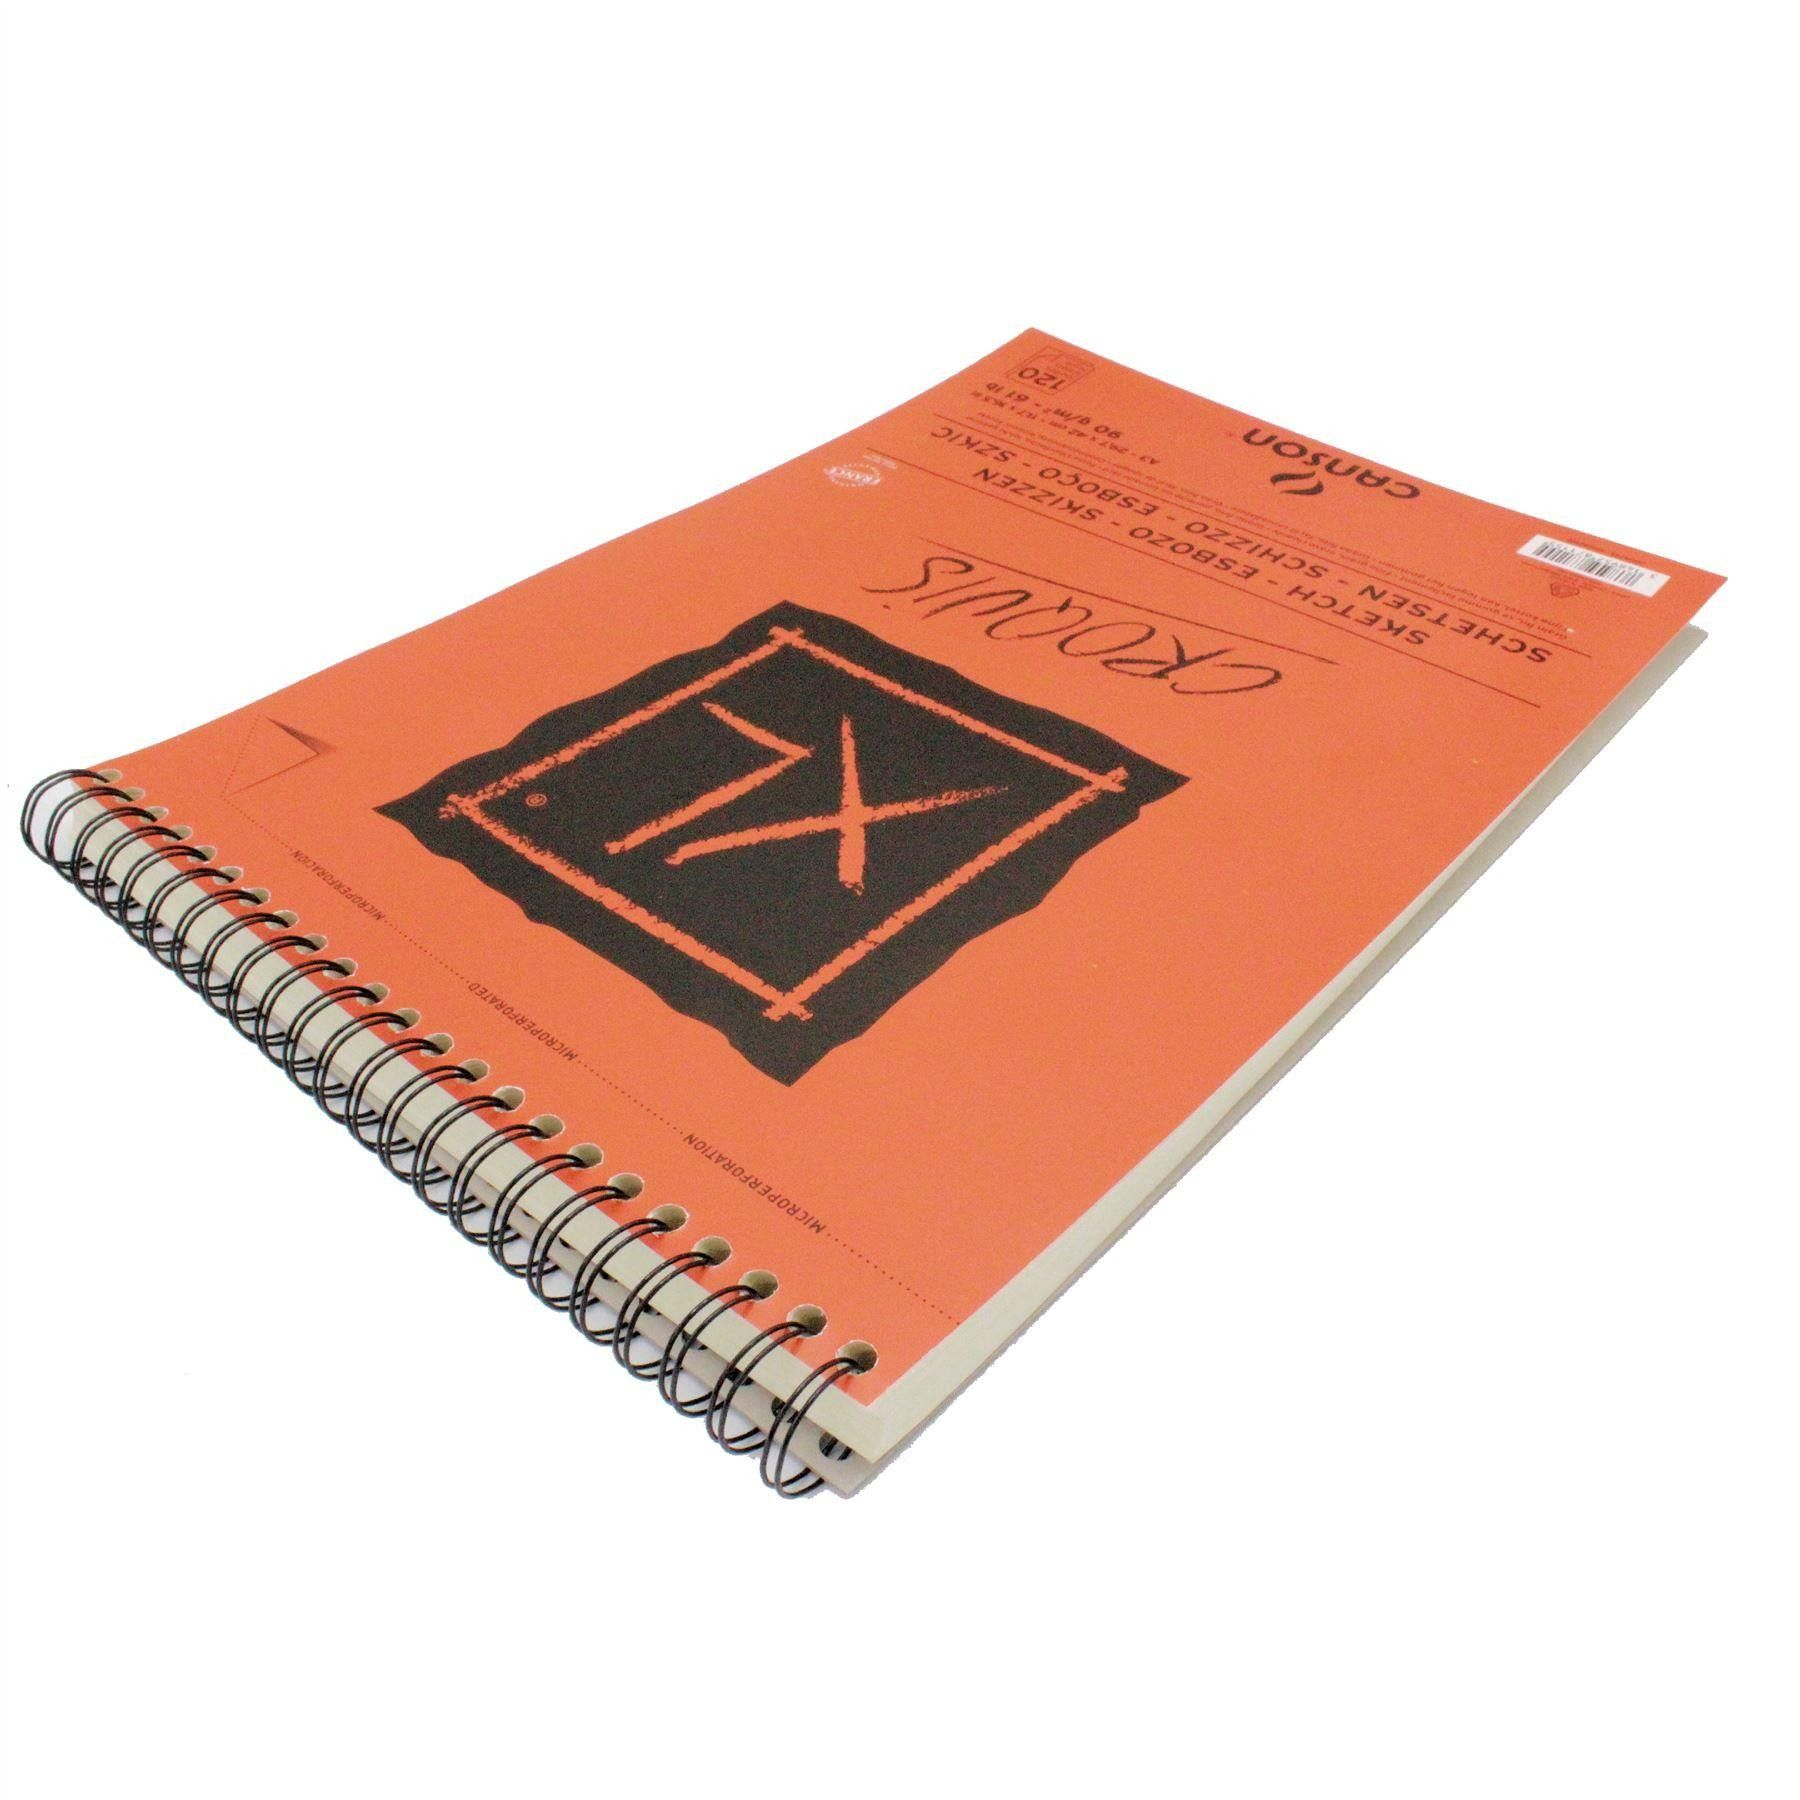 Canson Xl Artsits Sketch Paper Pad 90gsm A5 A4 A3 Or A2 Sketch